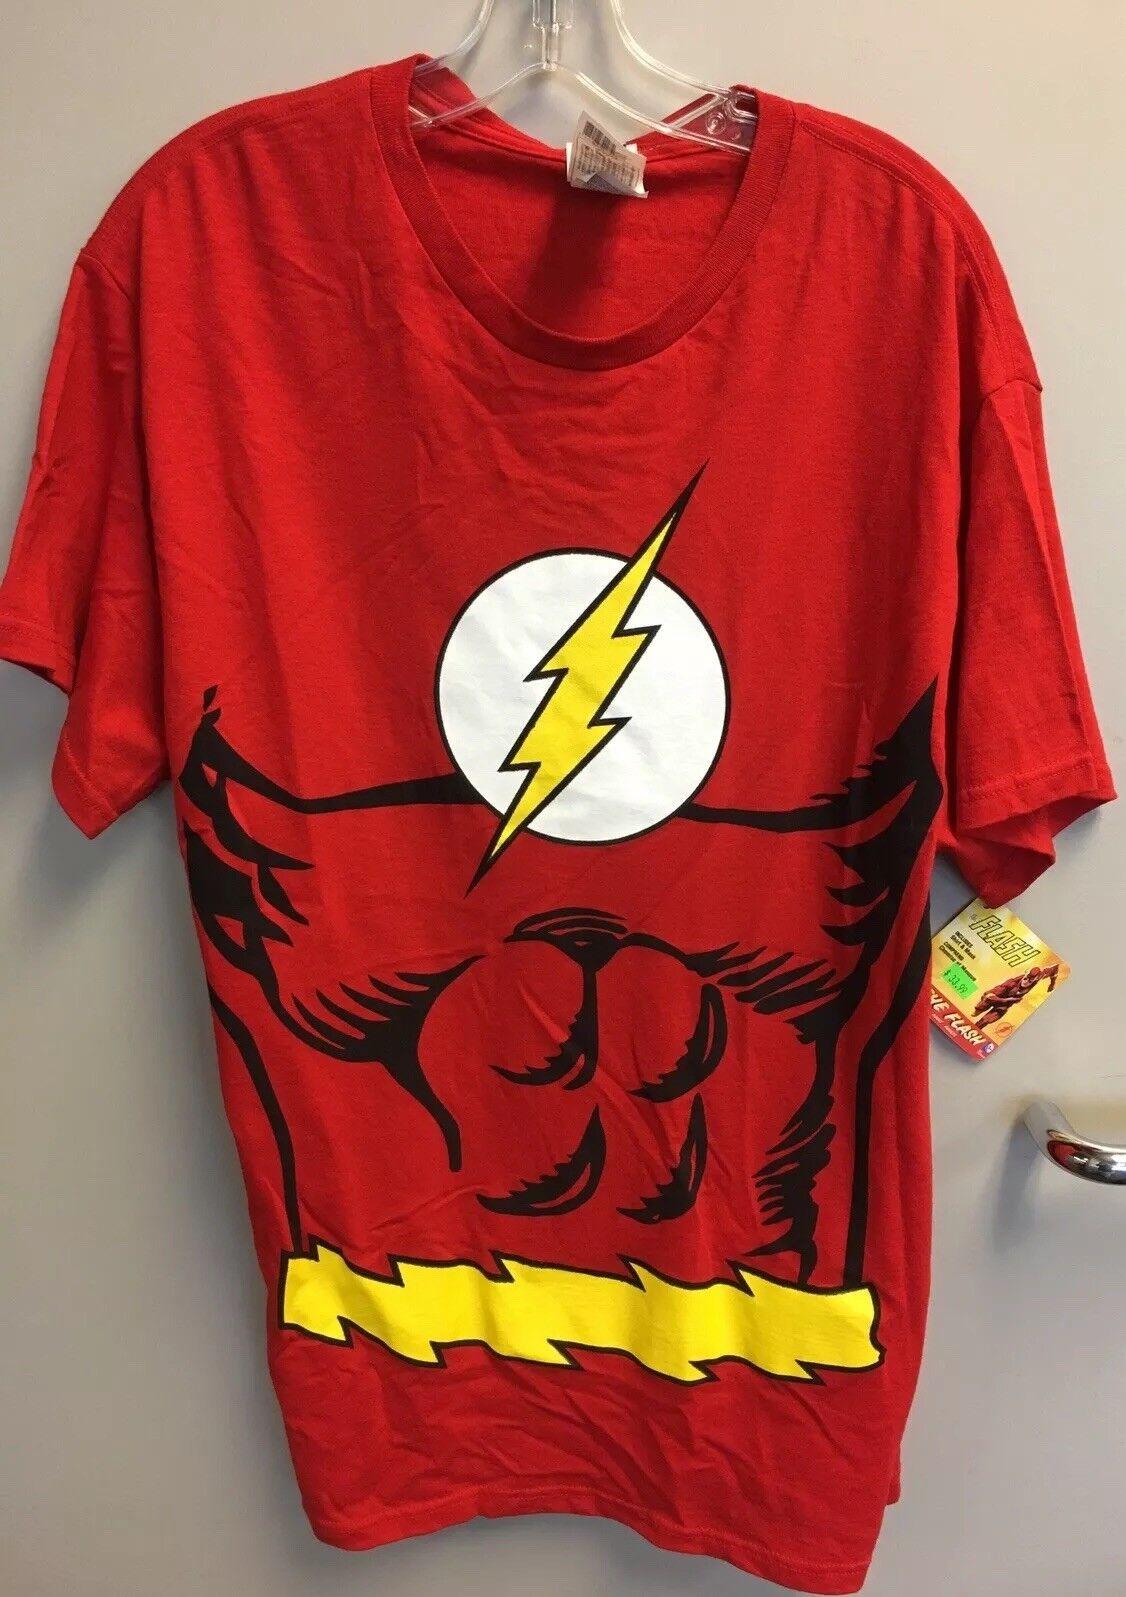 Rubies Costume DC Comics Justice League Superhero Style Adult Printed Top